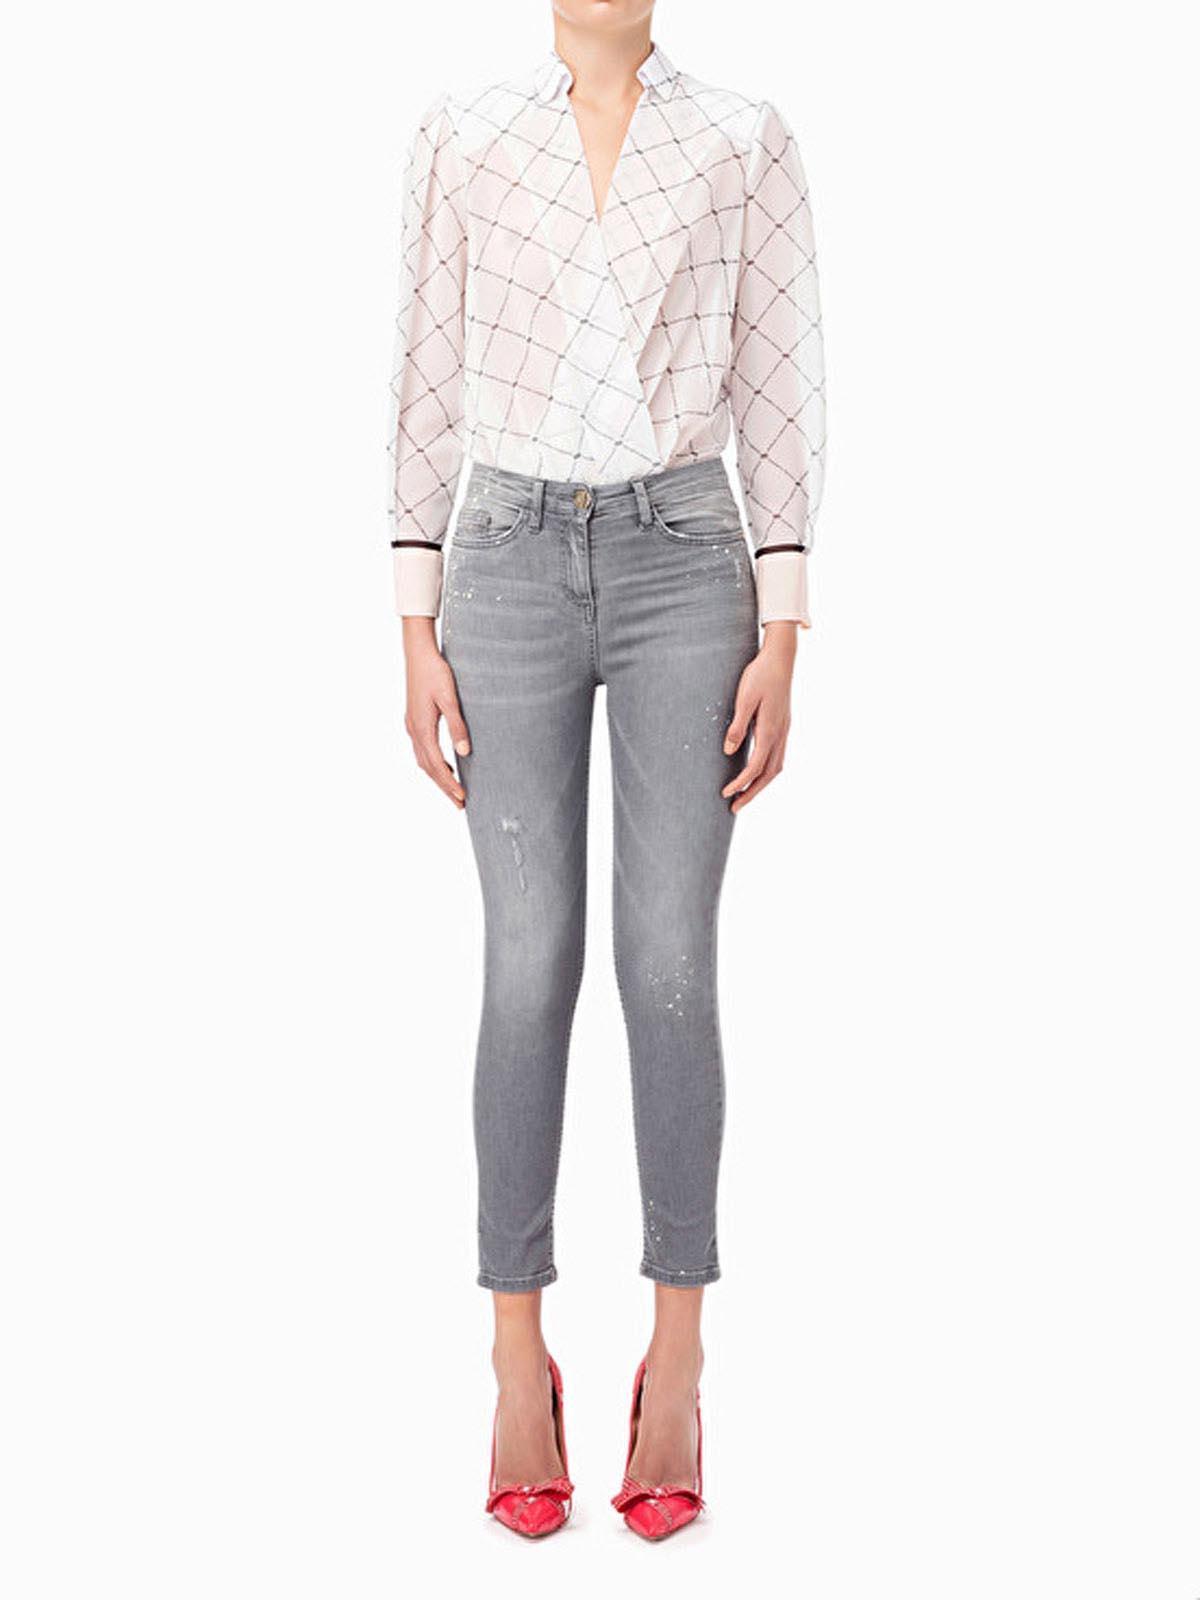 Elisabetta Franchi PJ01D91E2 Jeans Skinny 921a2c3aa97